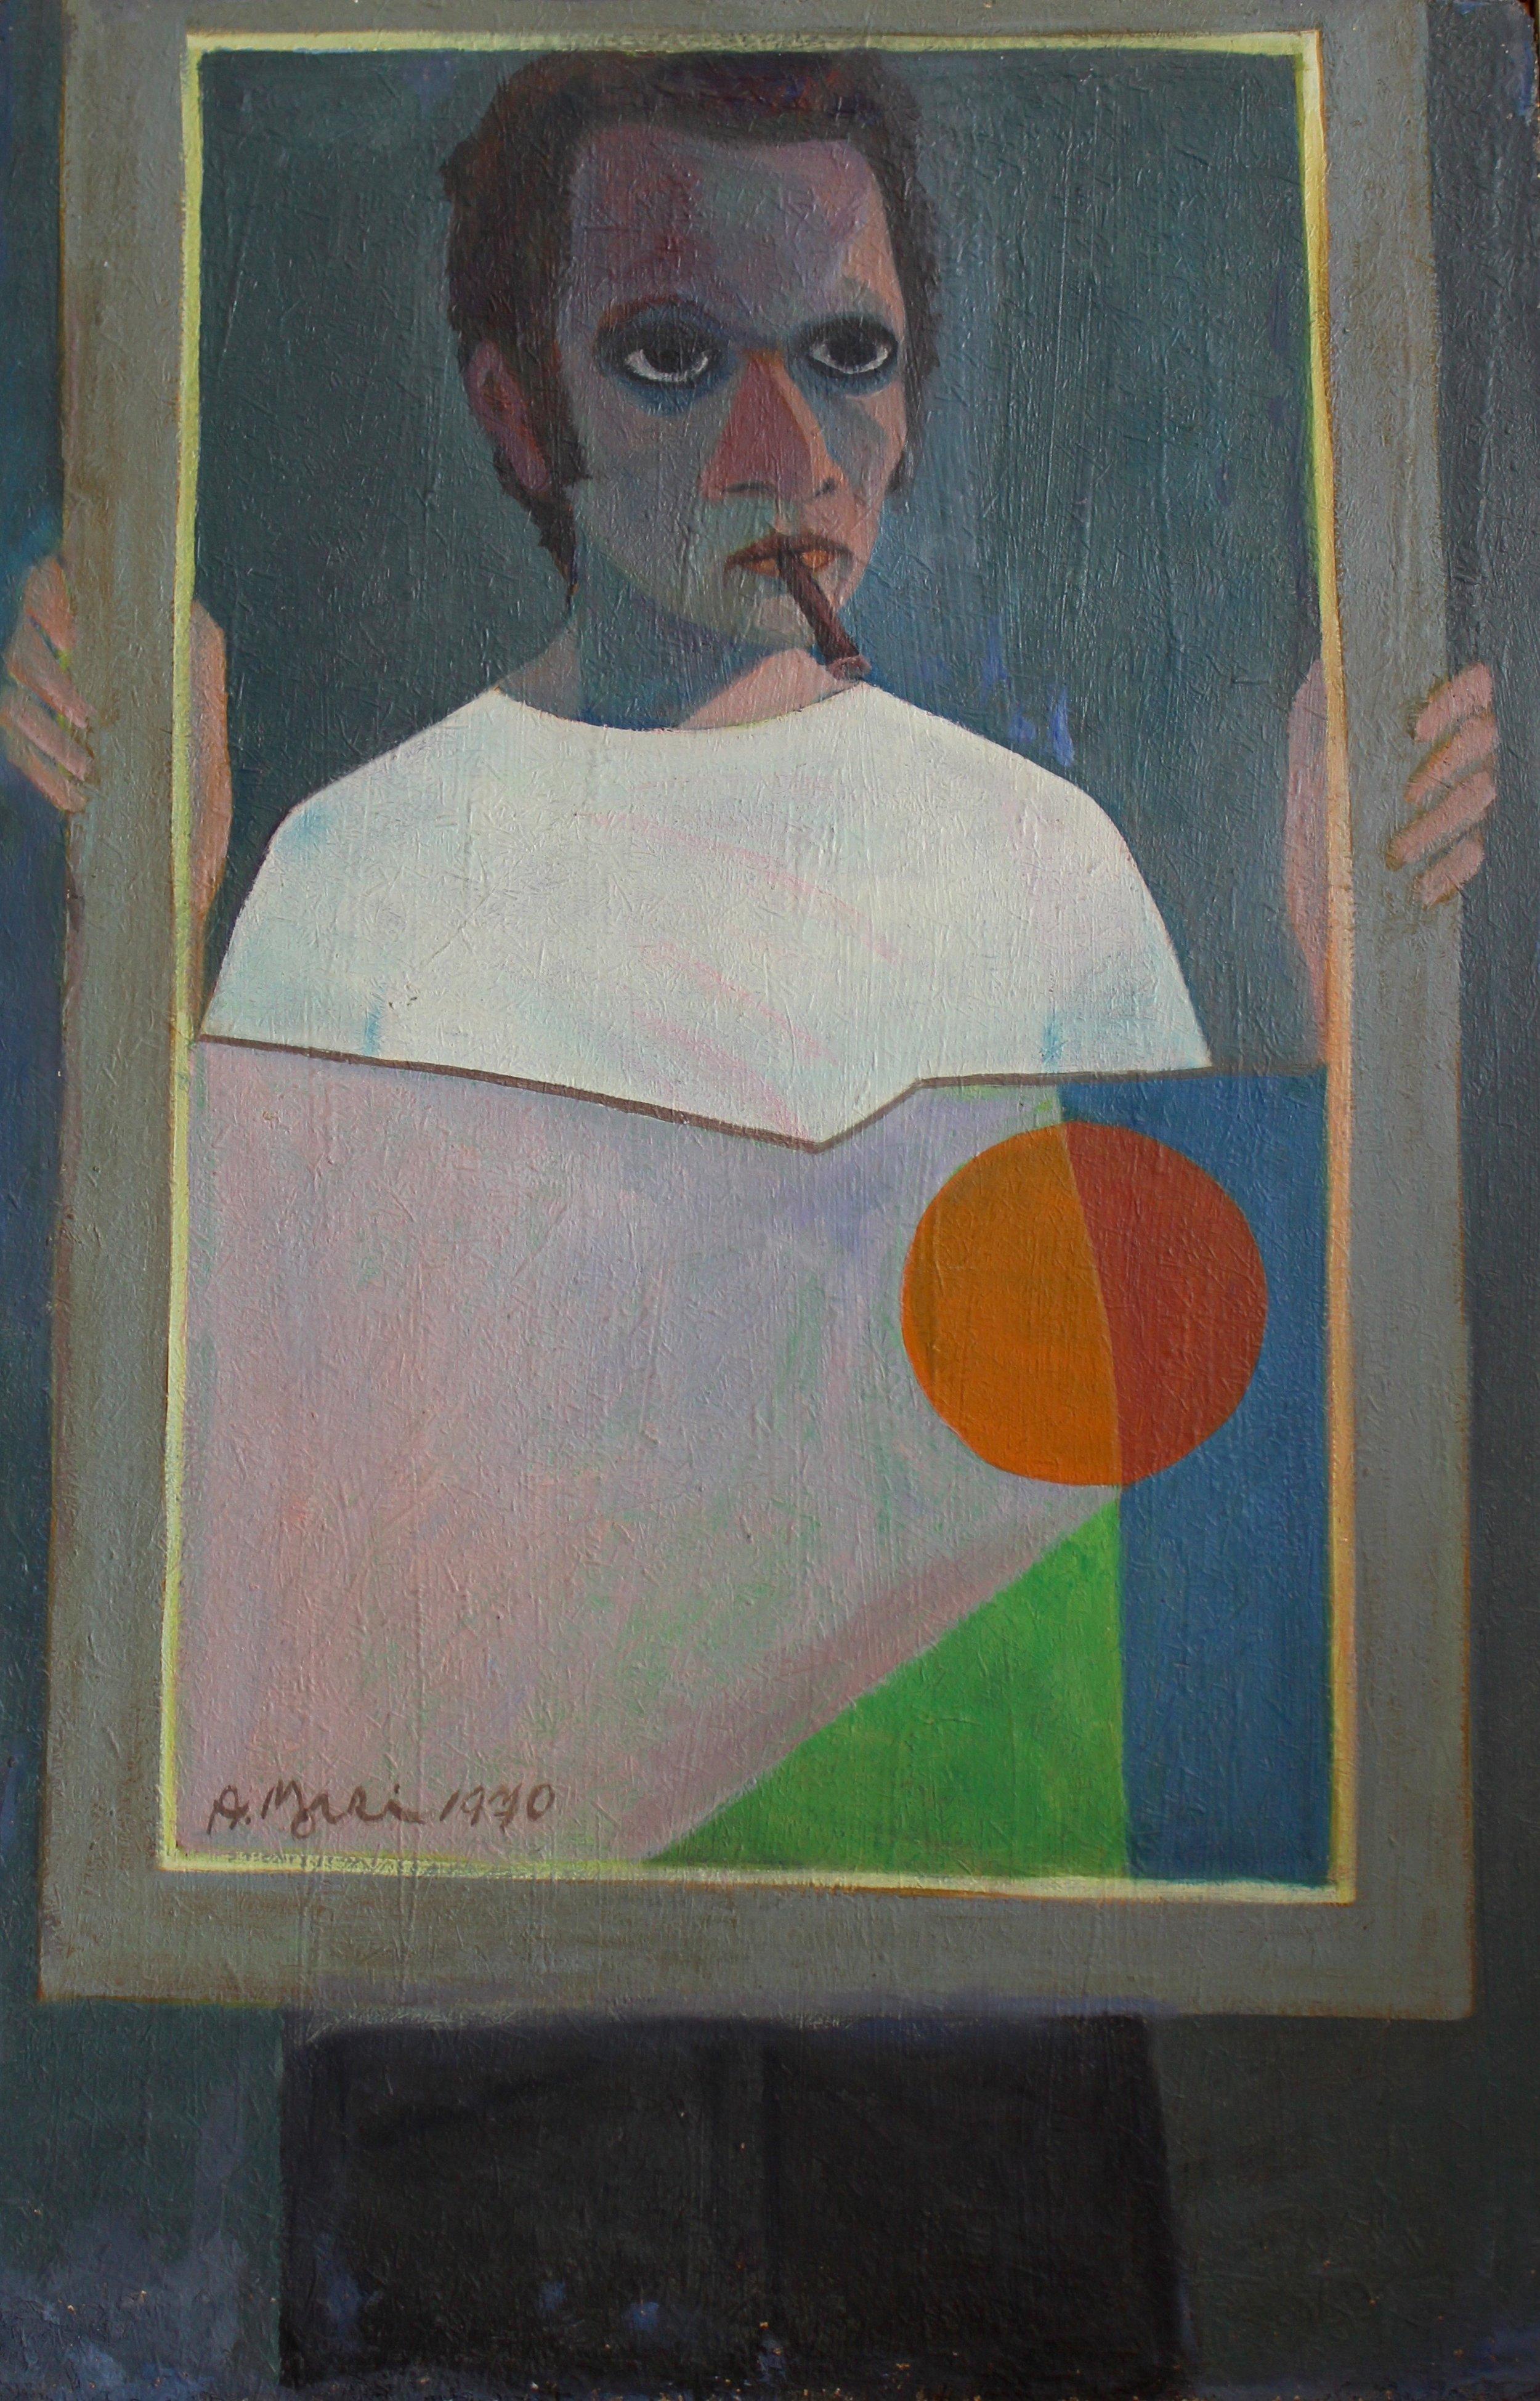 Ahmed_Morsi_Self_Portrait_1970.jpg